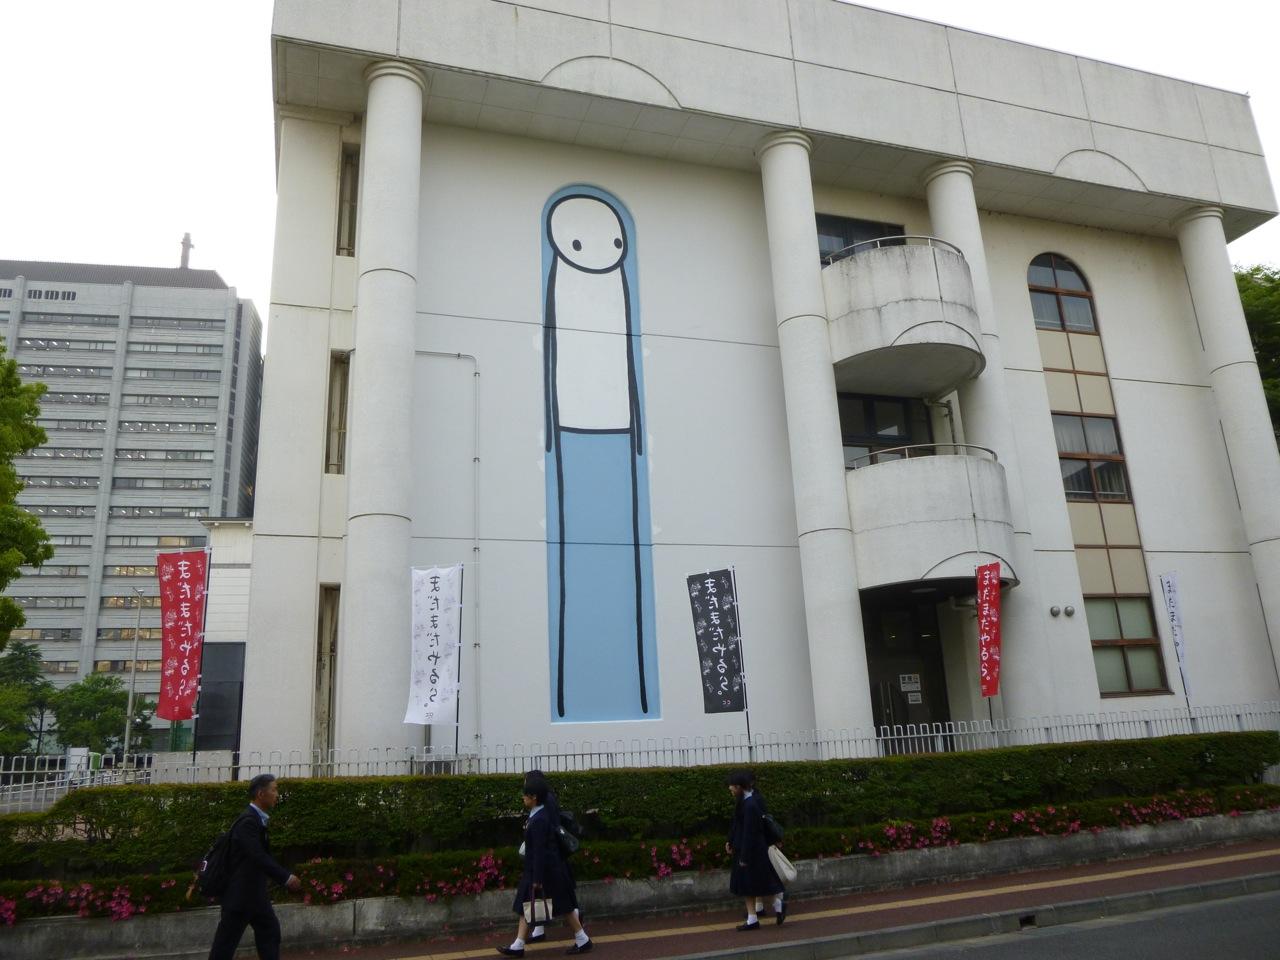 Shizuoka Japan  City new picture : Stik New Mural In Shizuoka, Japan